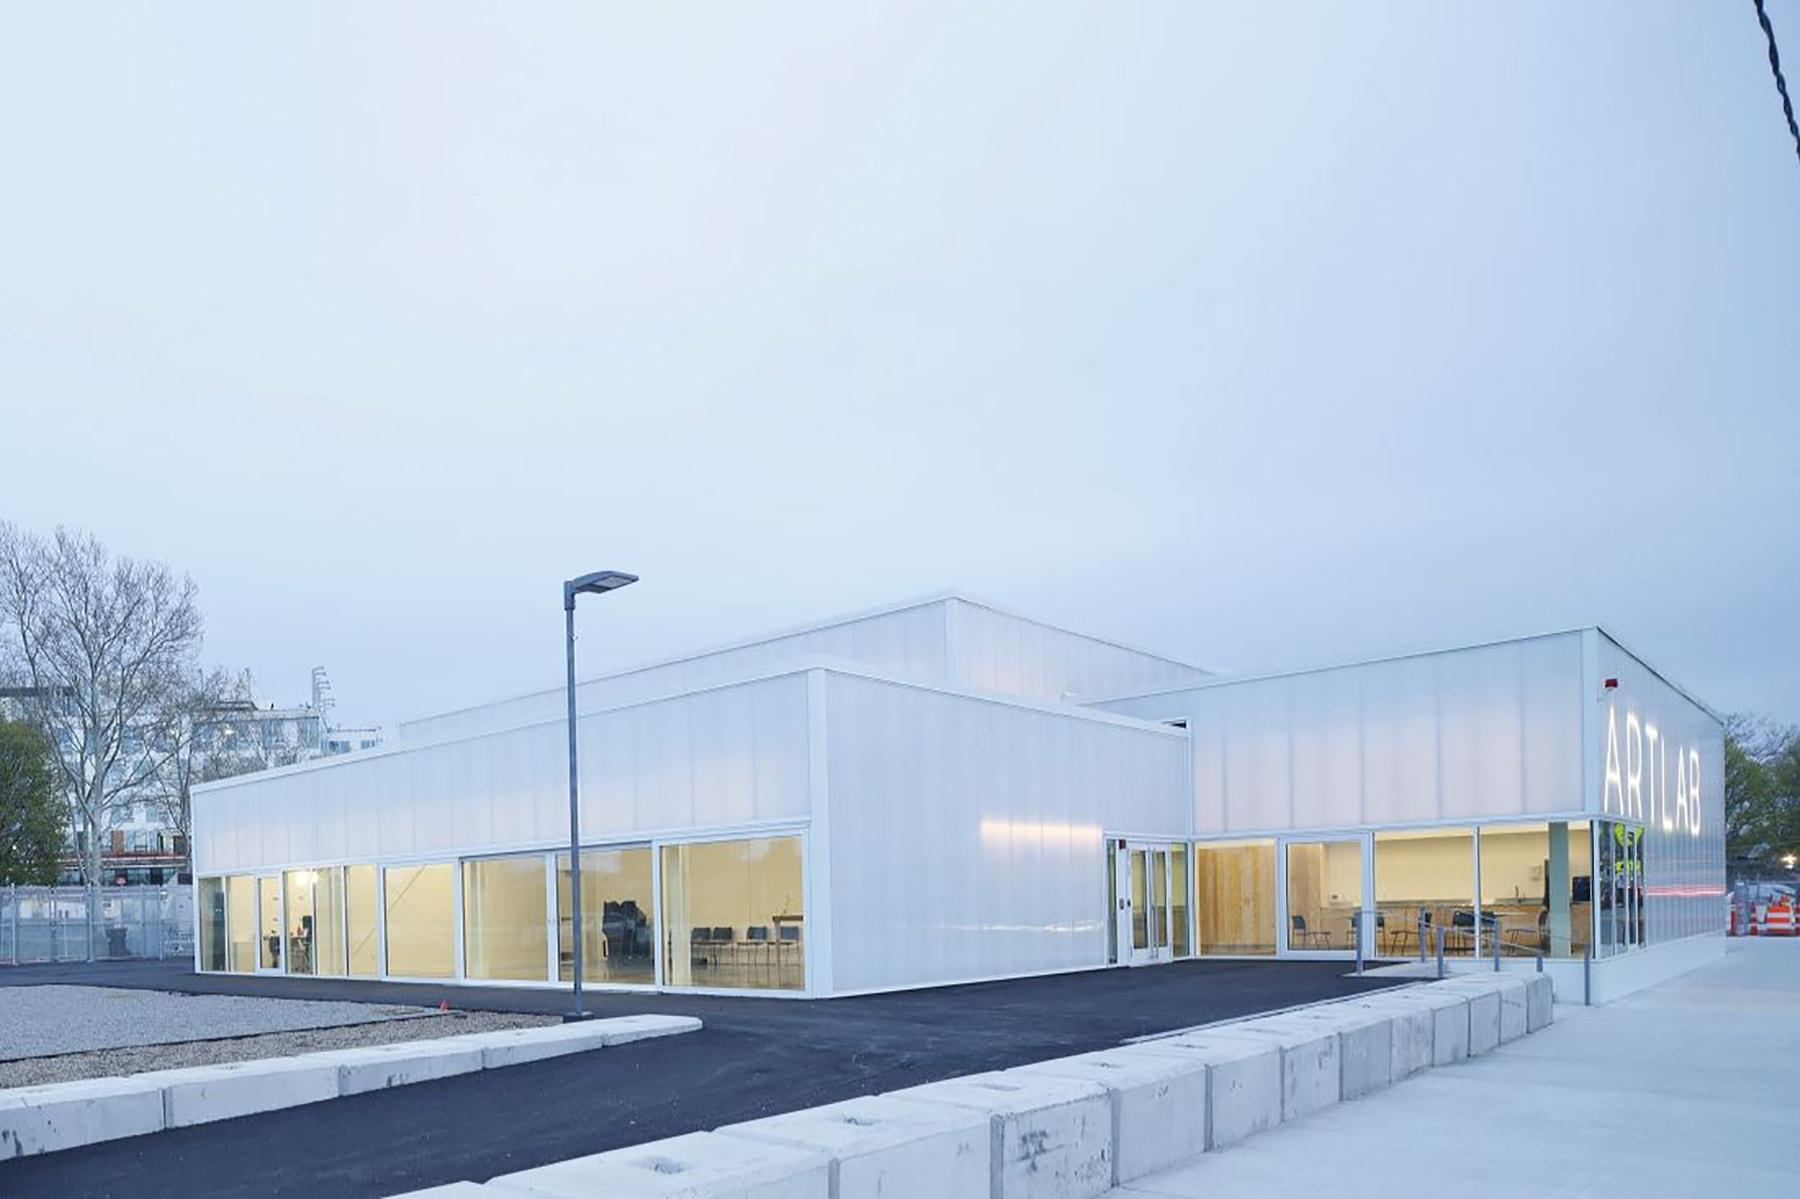 3_ArtLab_Barkow-Lebinger-Architects